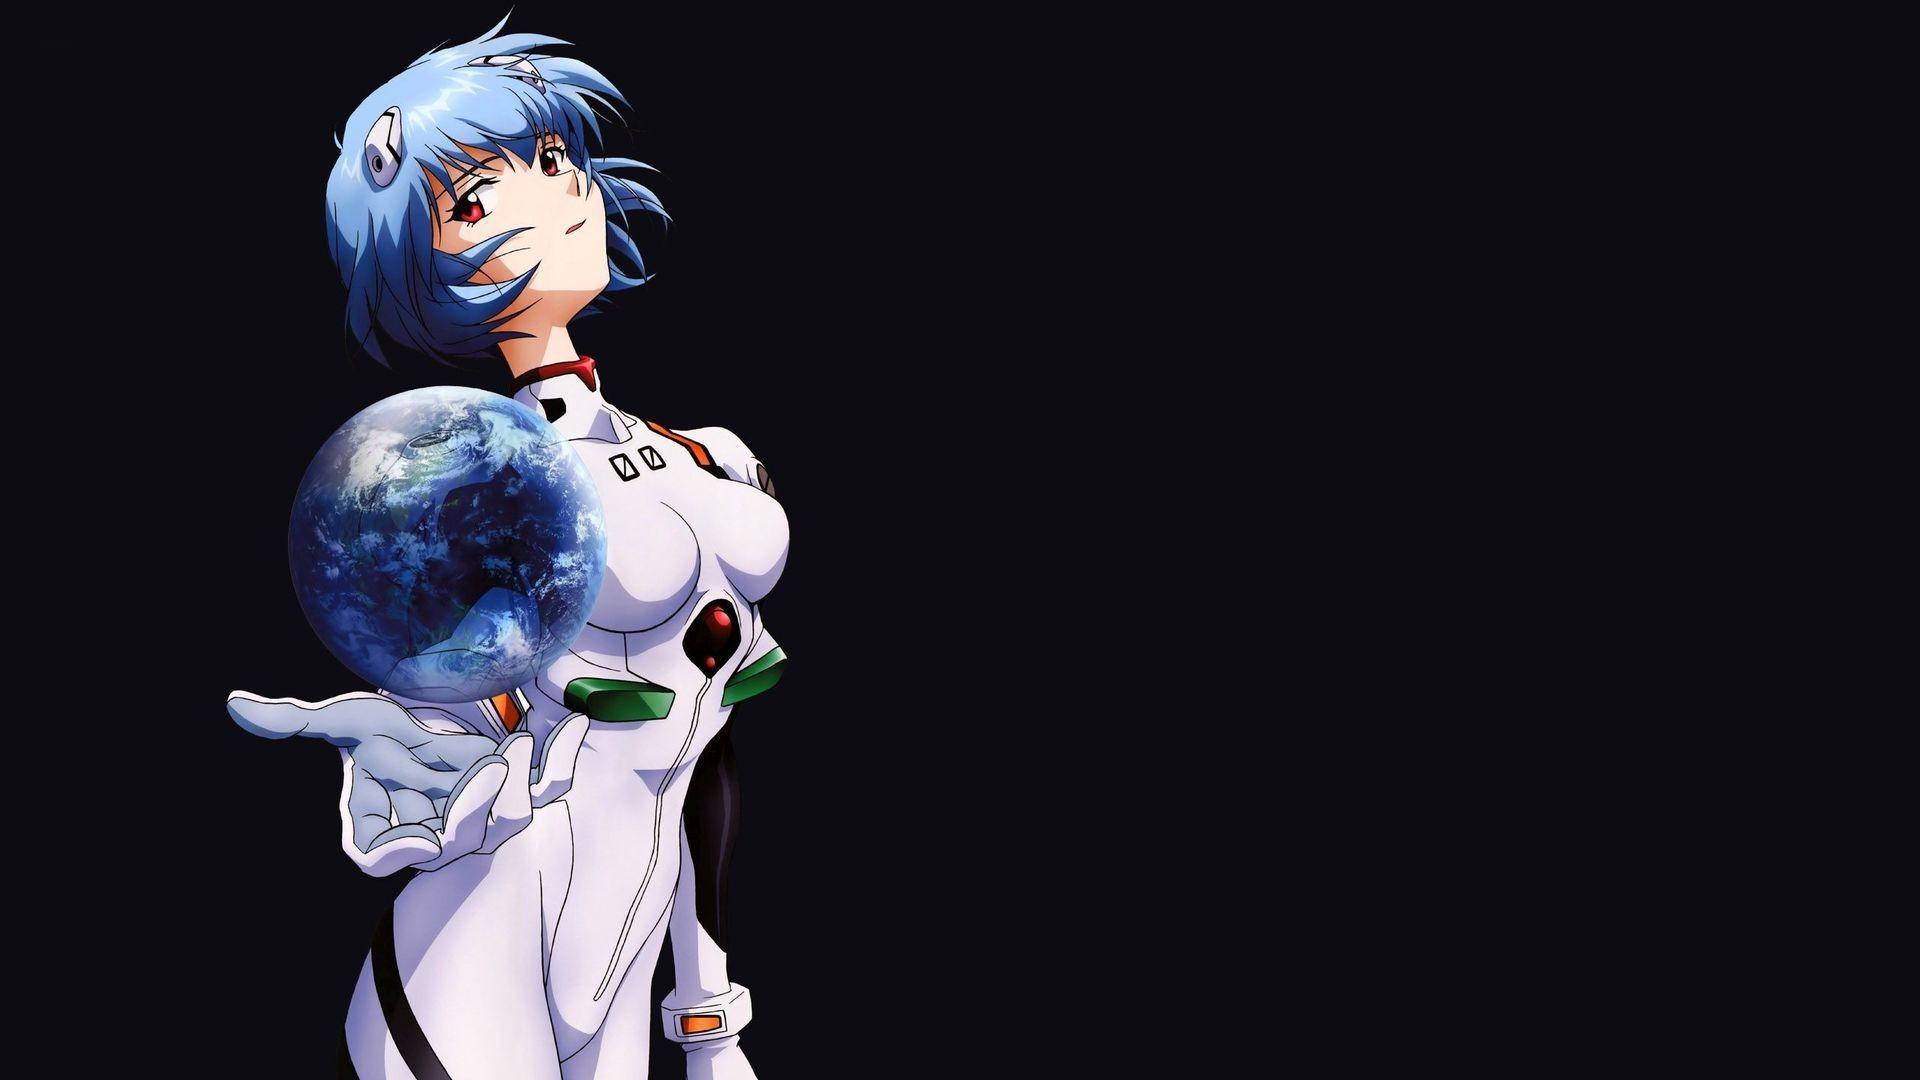 1920x1080 Px Anime Ayanami Rei Blue Neon Genesis Evangelion Simple Background